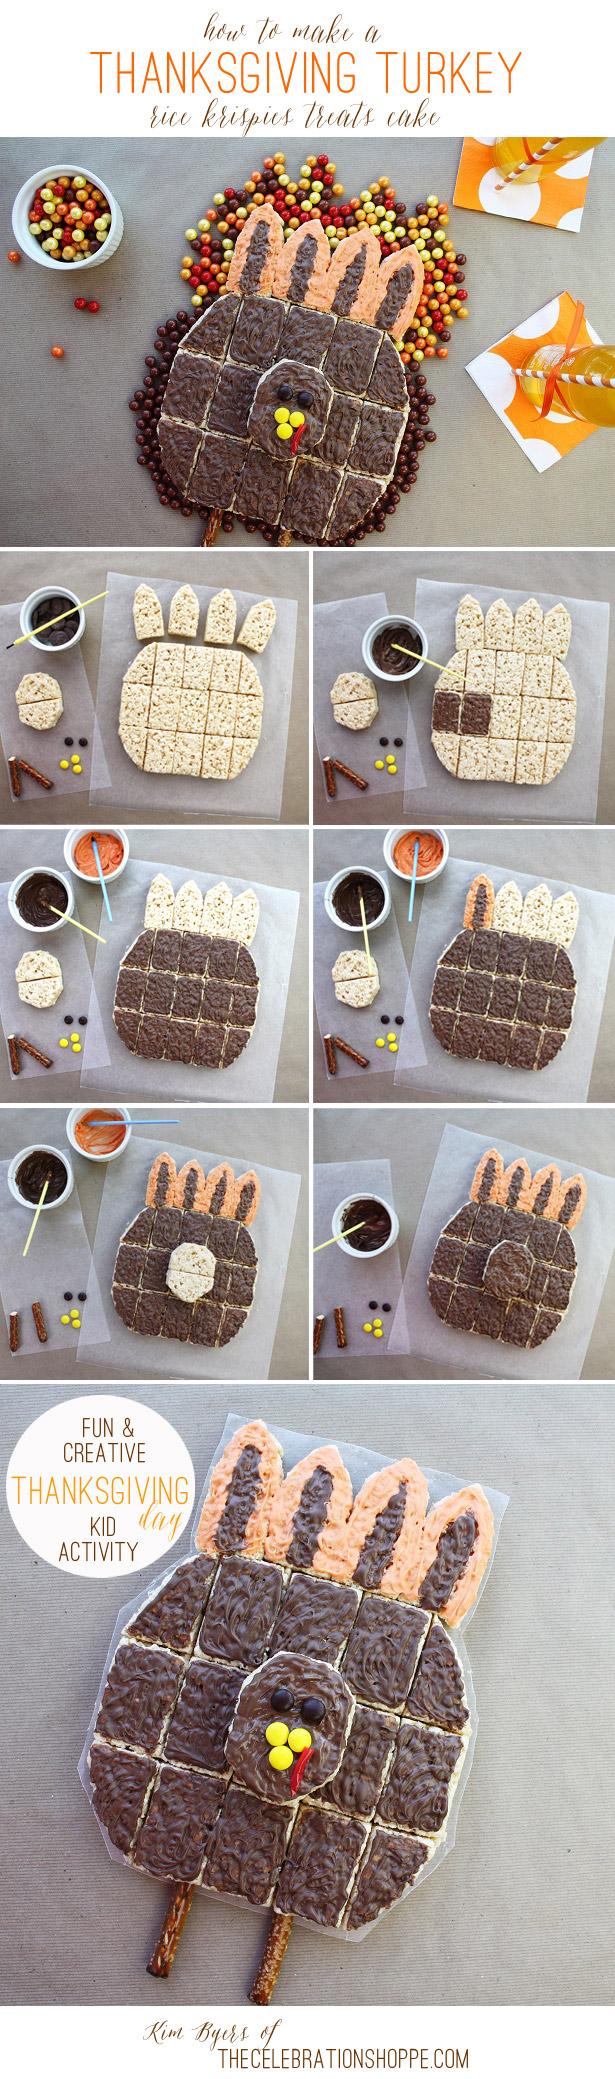 Kid Craft: Thanksgiving Turkey Rice Krispies Treat Cake | Kim Byers, TheCelebrationShoppe.com